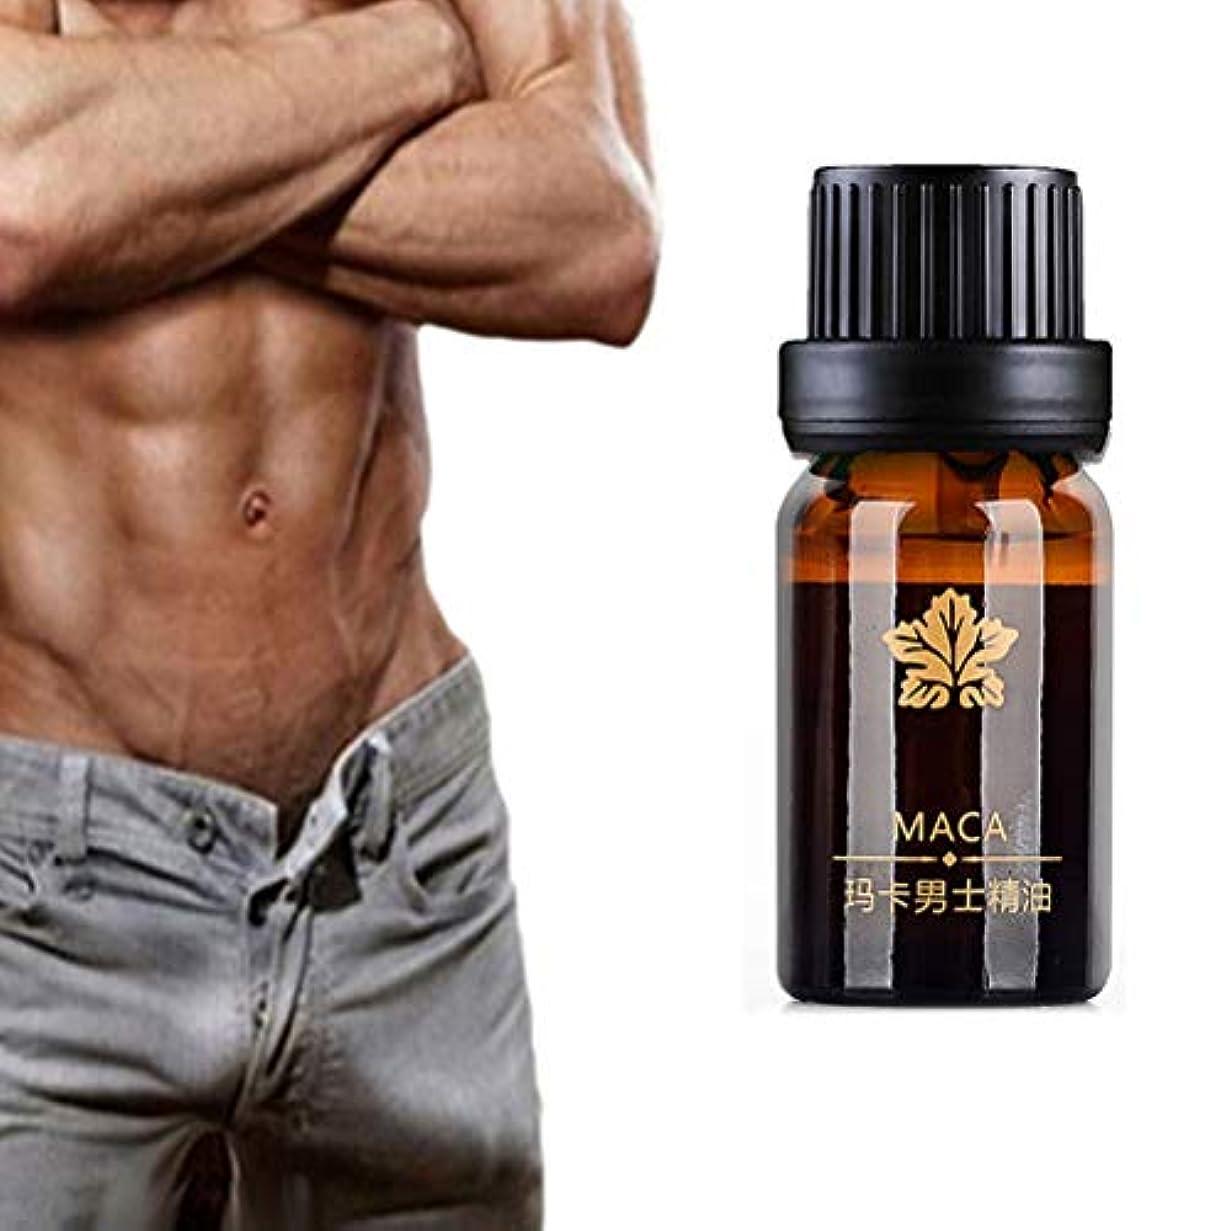 hapler ペニス栄養オイル 男性用オイル ペニス拡大 勃起 より長い より大きく マッサージオイル エッセンシャルオイル ペニス用 マッサージオイル 陰茎拡大オイル 健康ケア